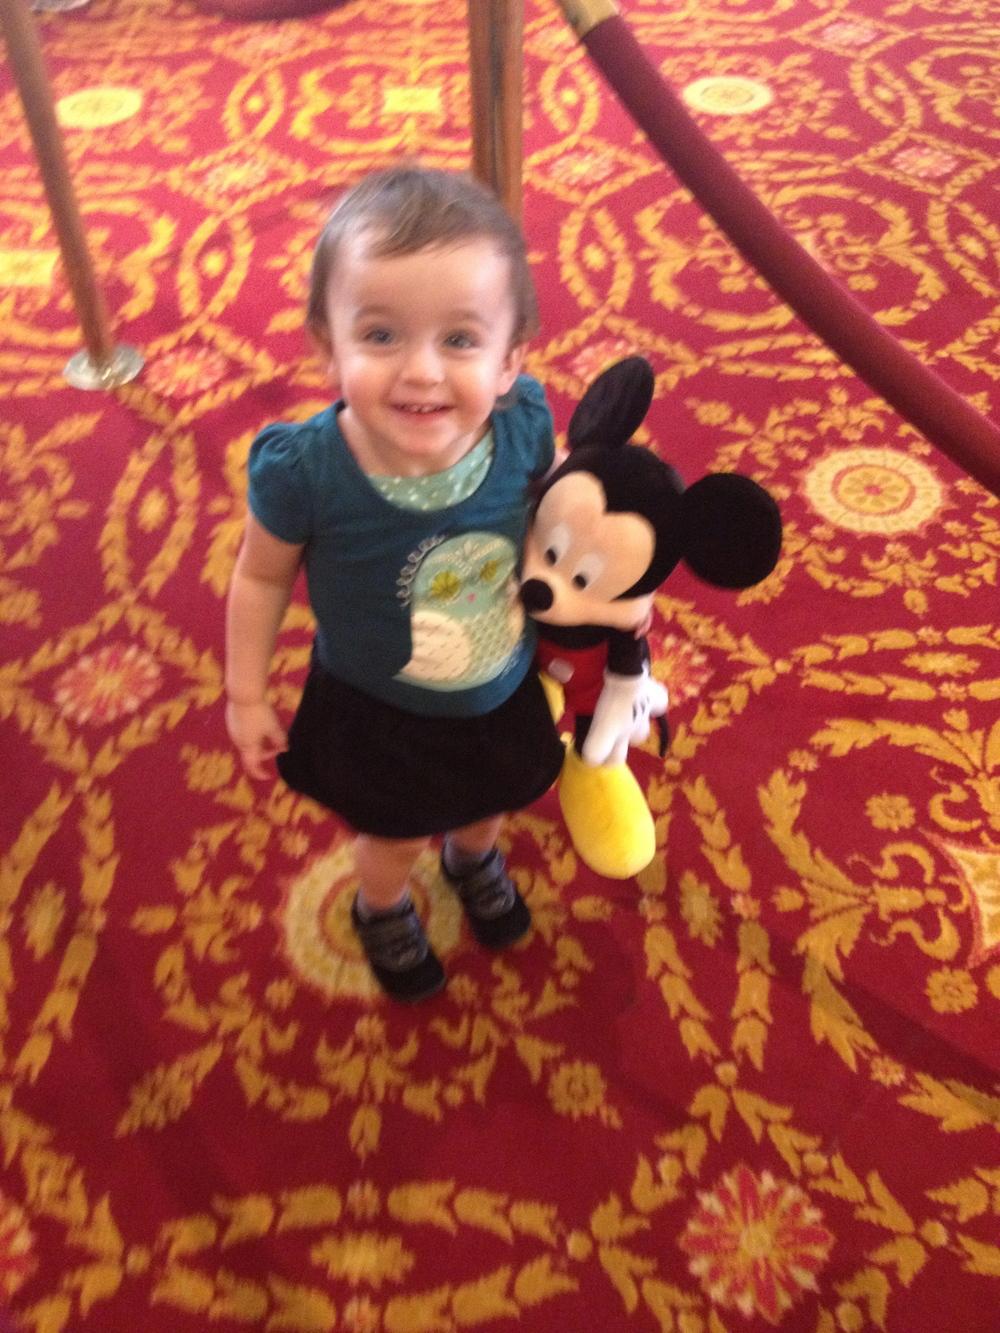 D's Mickey